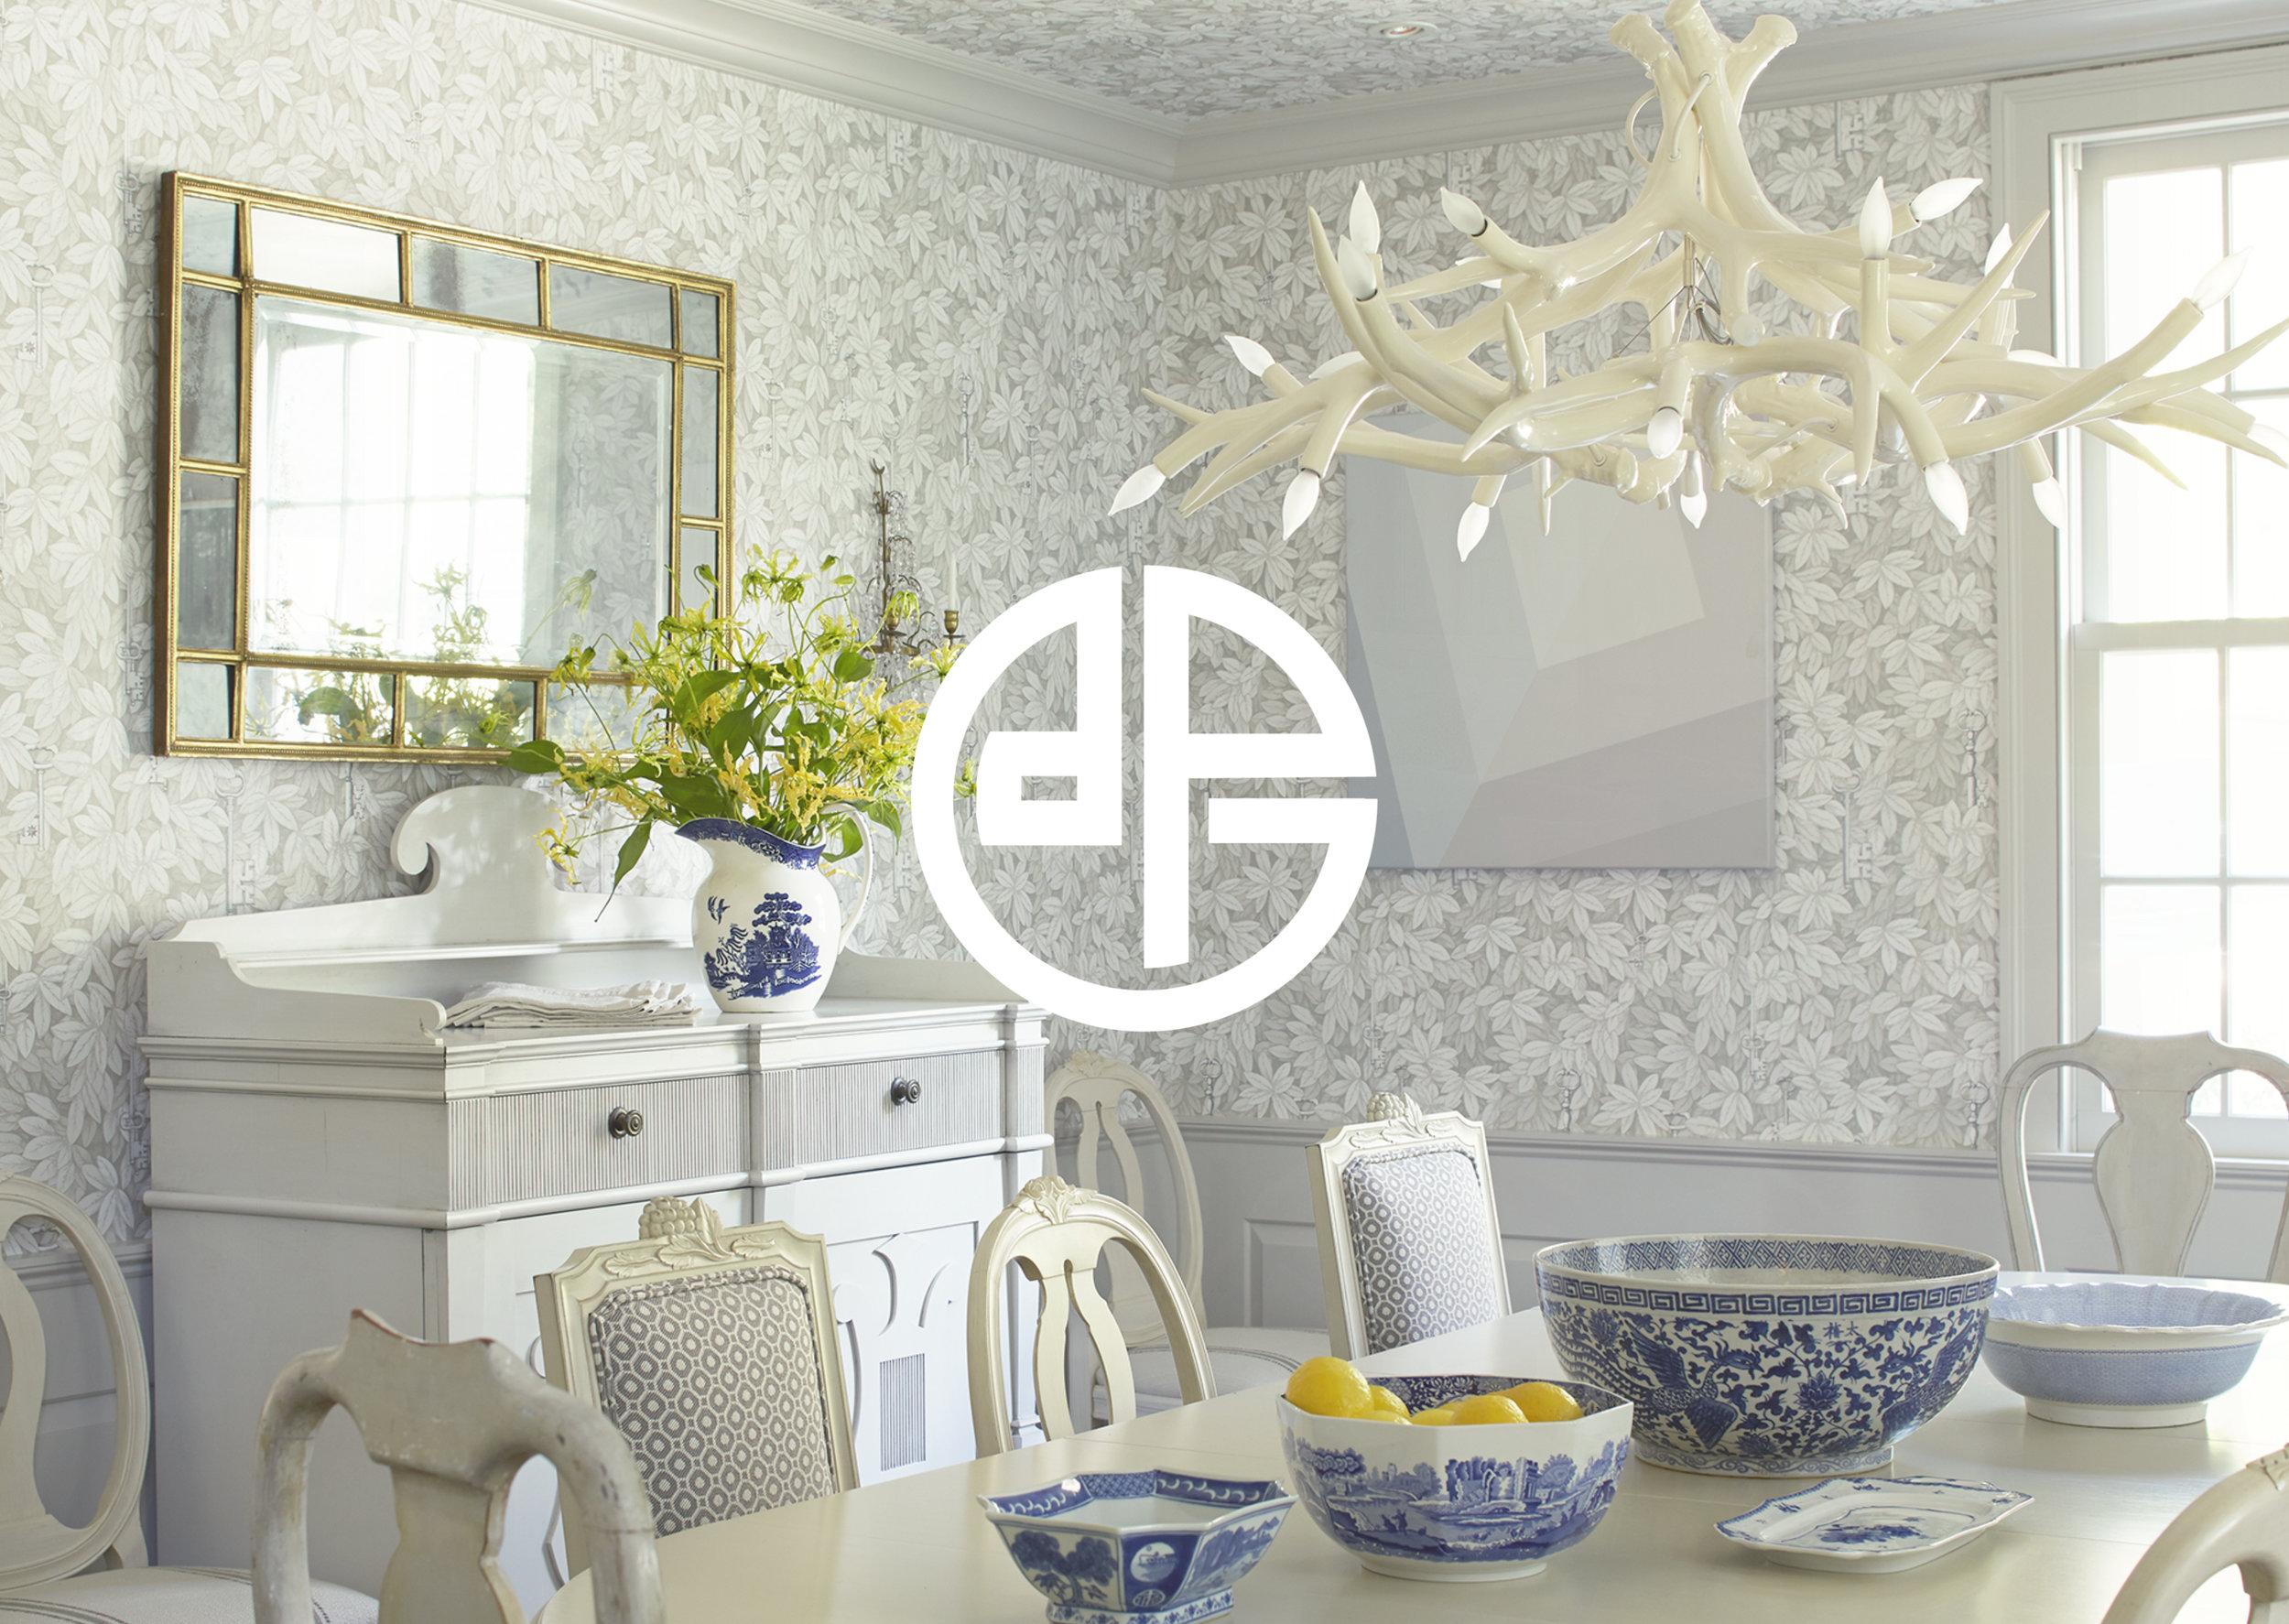 widbee luxury tywkiwdbi wiki design tai interior nyc of room interesting hotel internships